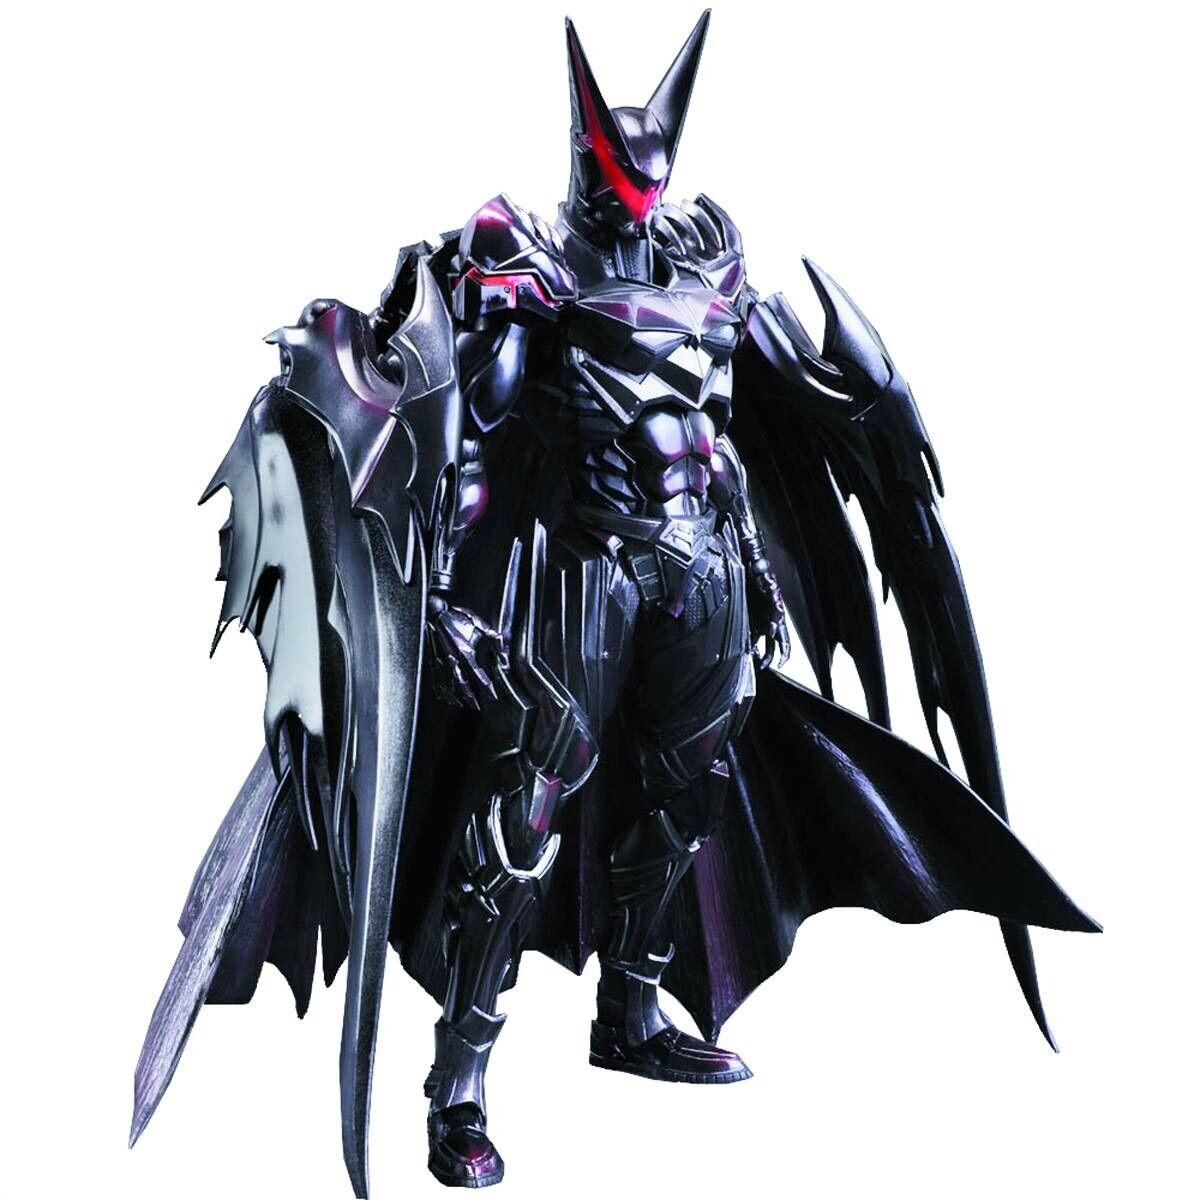 Dc Comics Variant Jugar Arts Kai Batman Tetsuya Figura Mib  final Fantasy